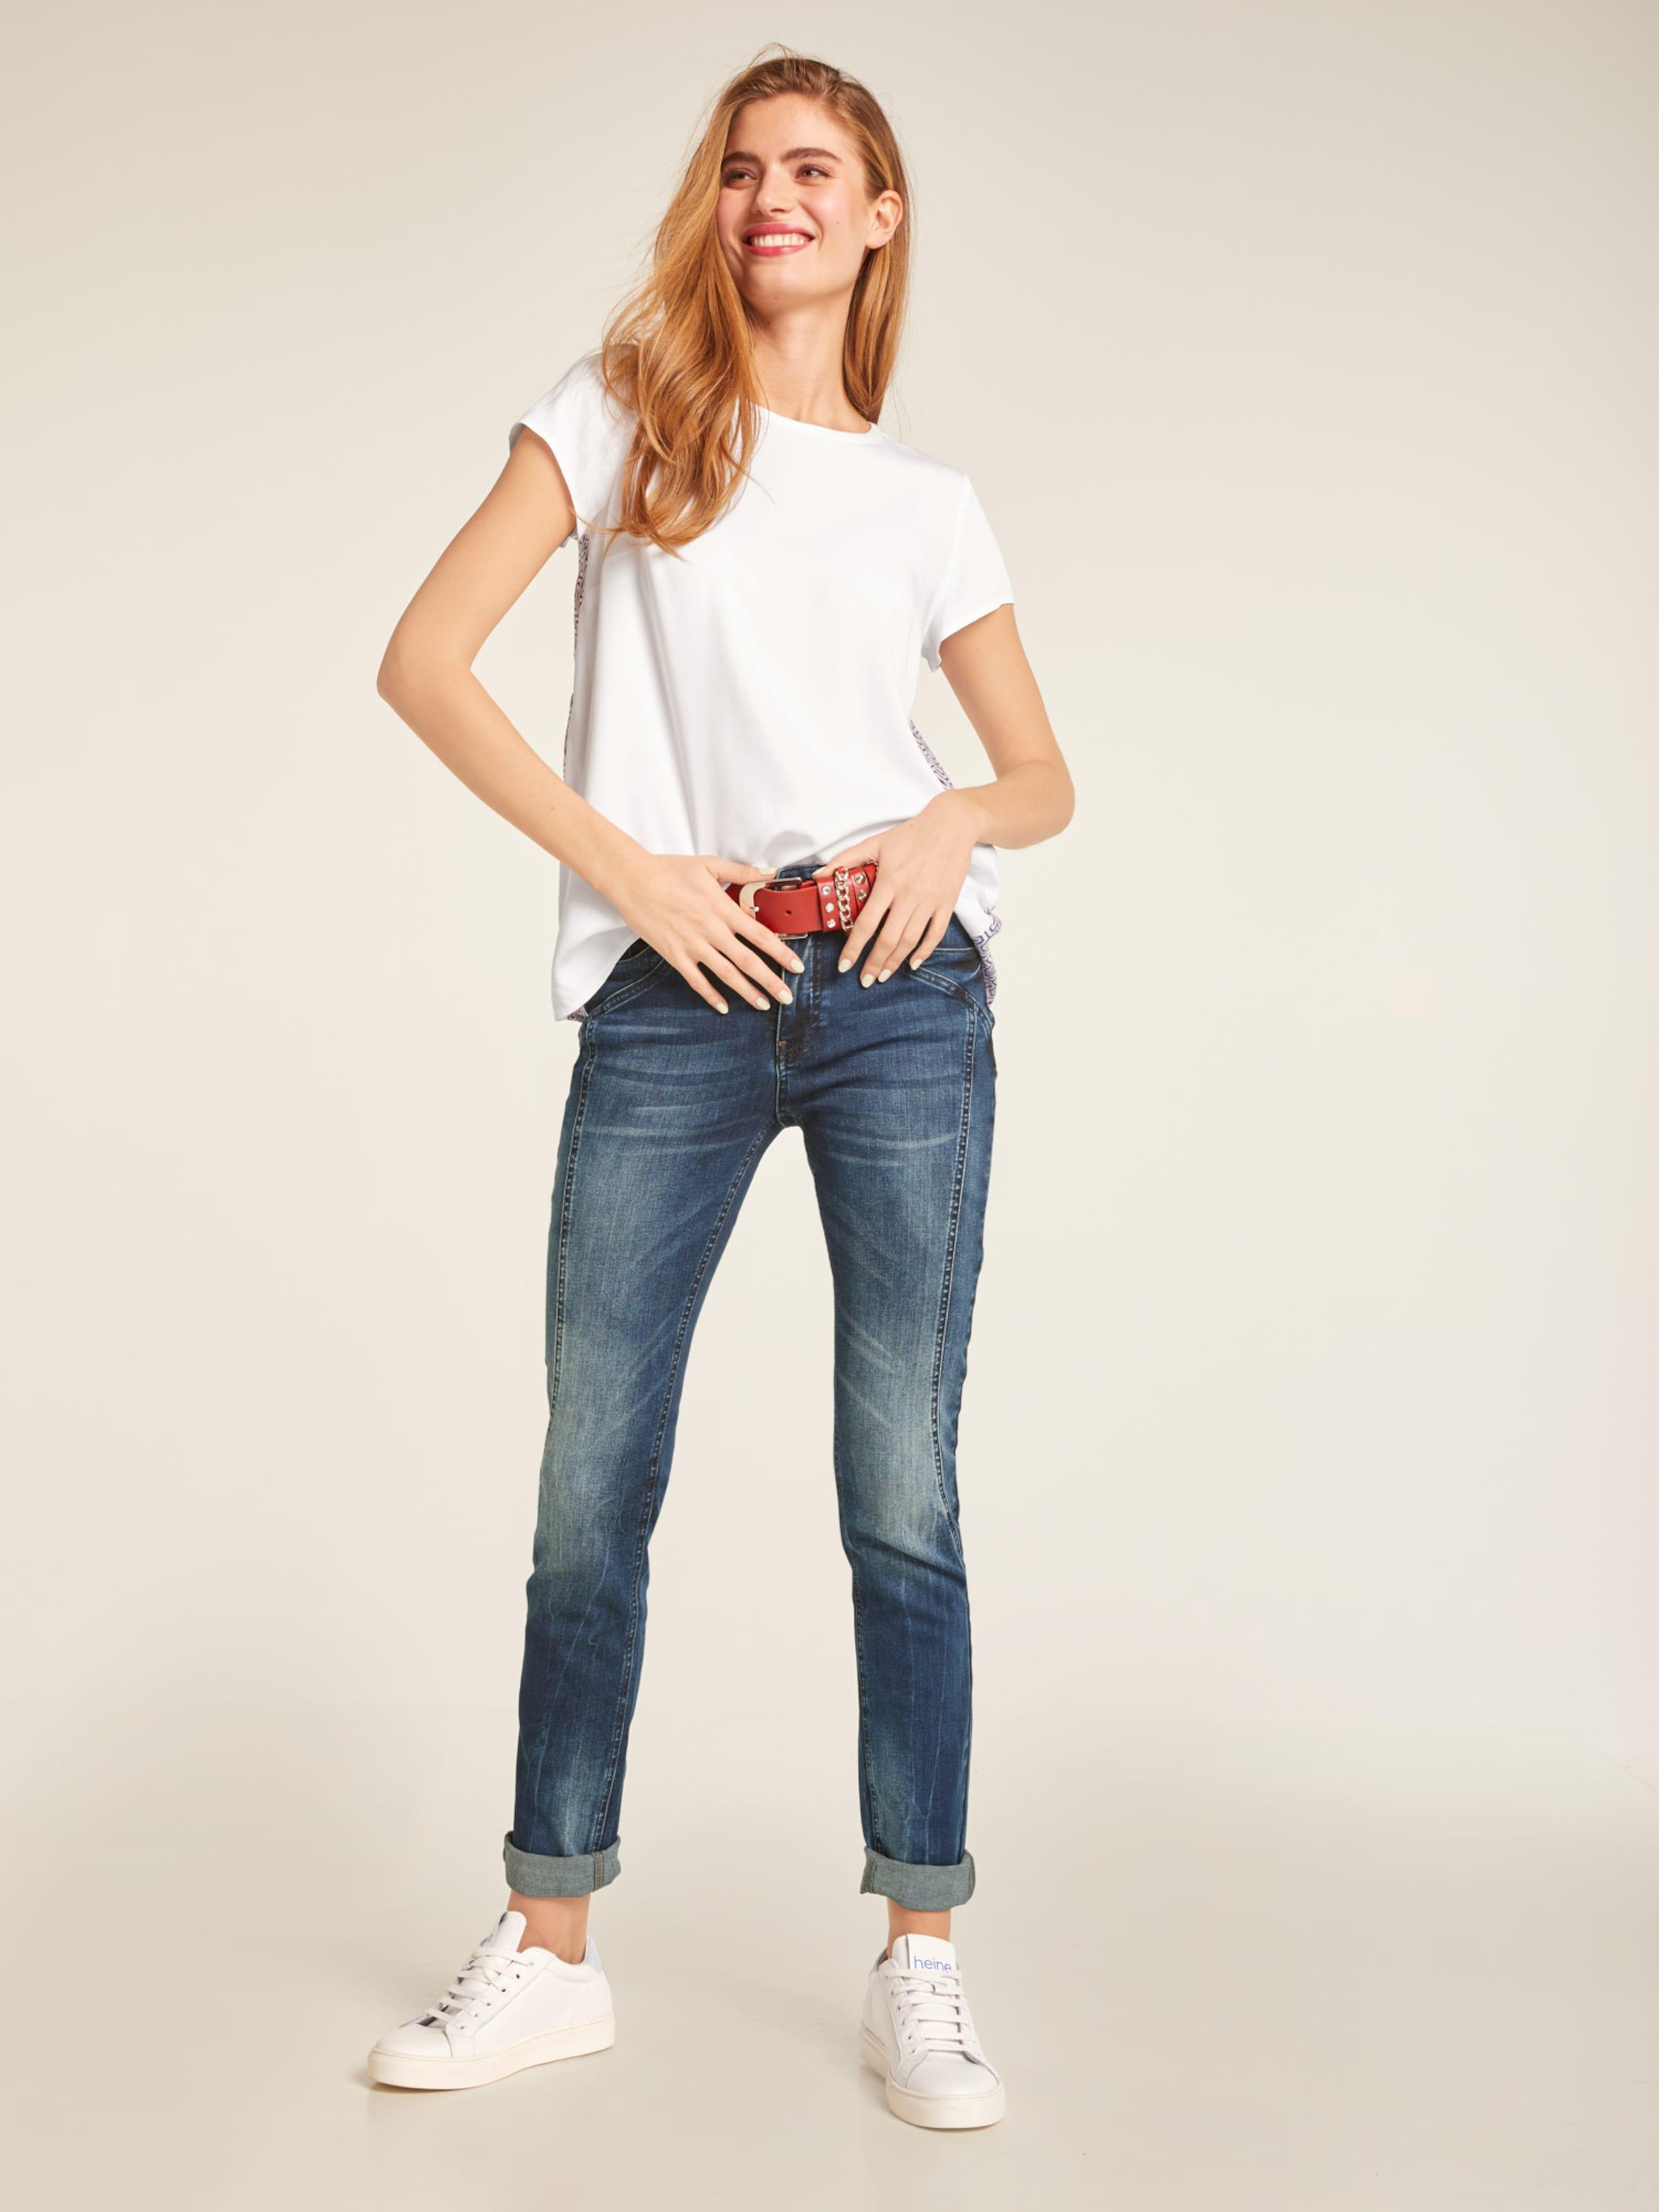 Jeans In Heine Jeans DenimDunkelblau Heine Blue TFKclJ1